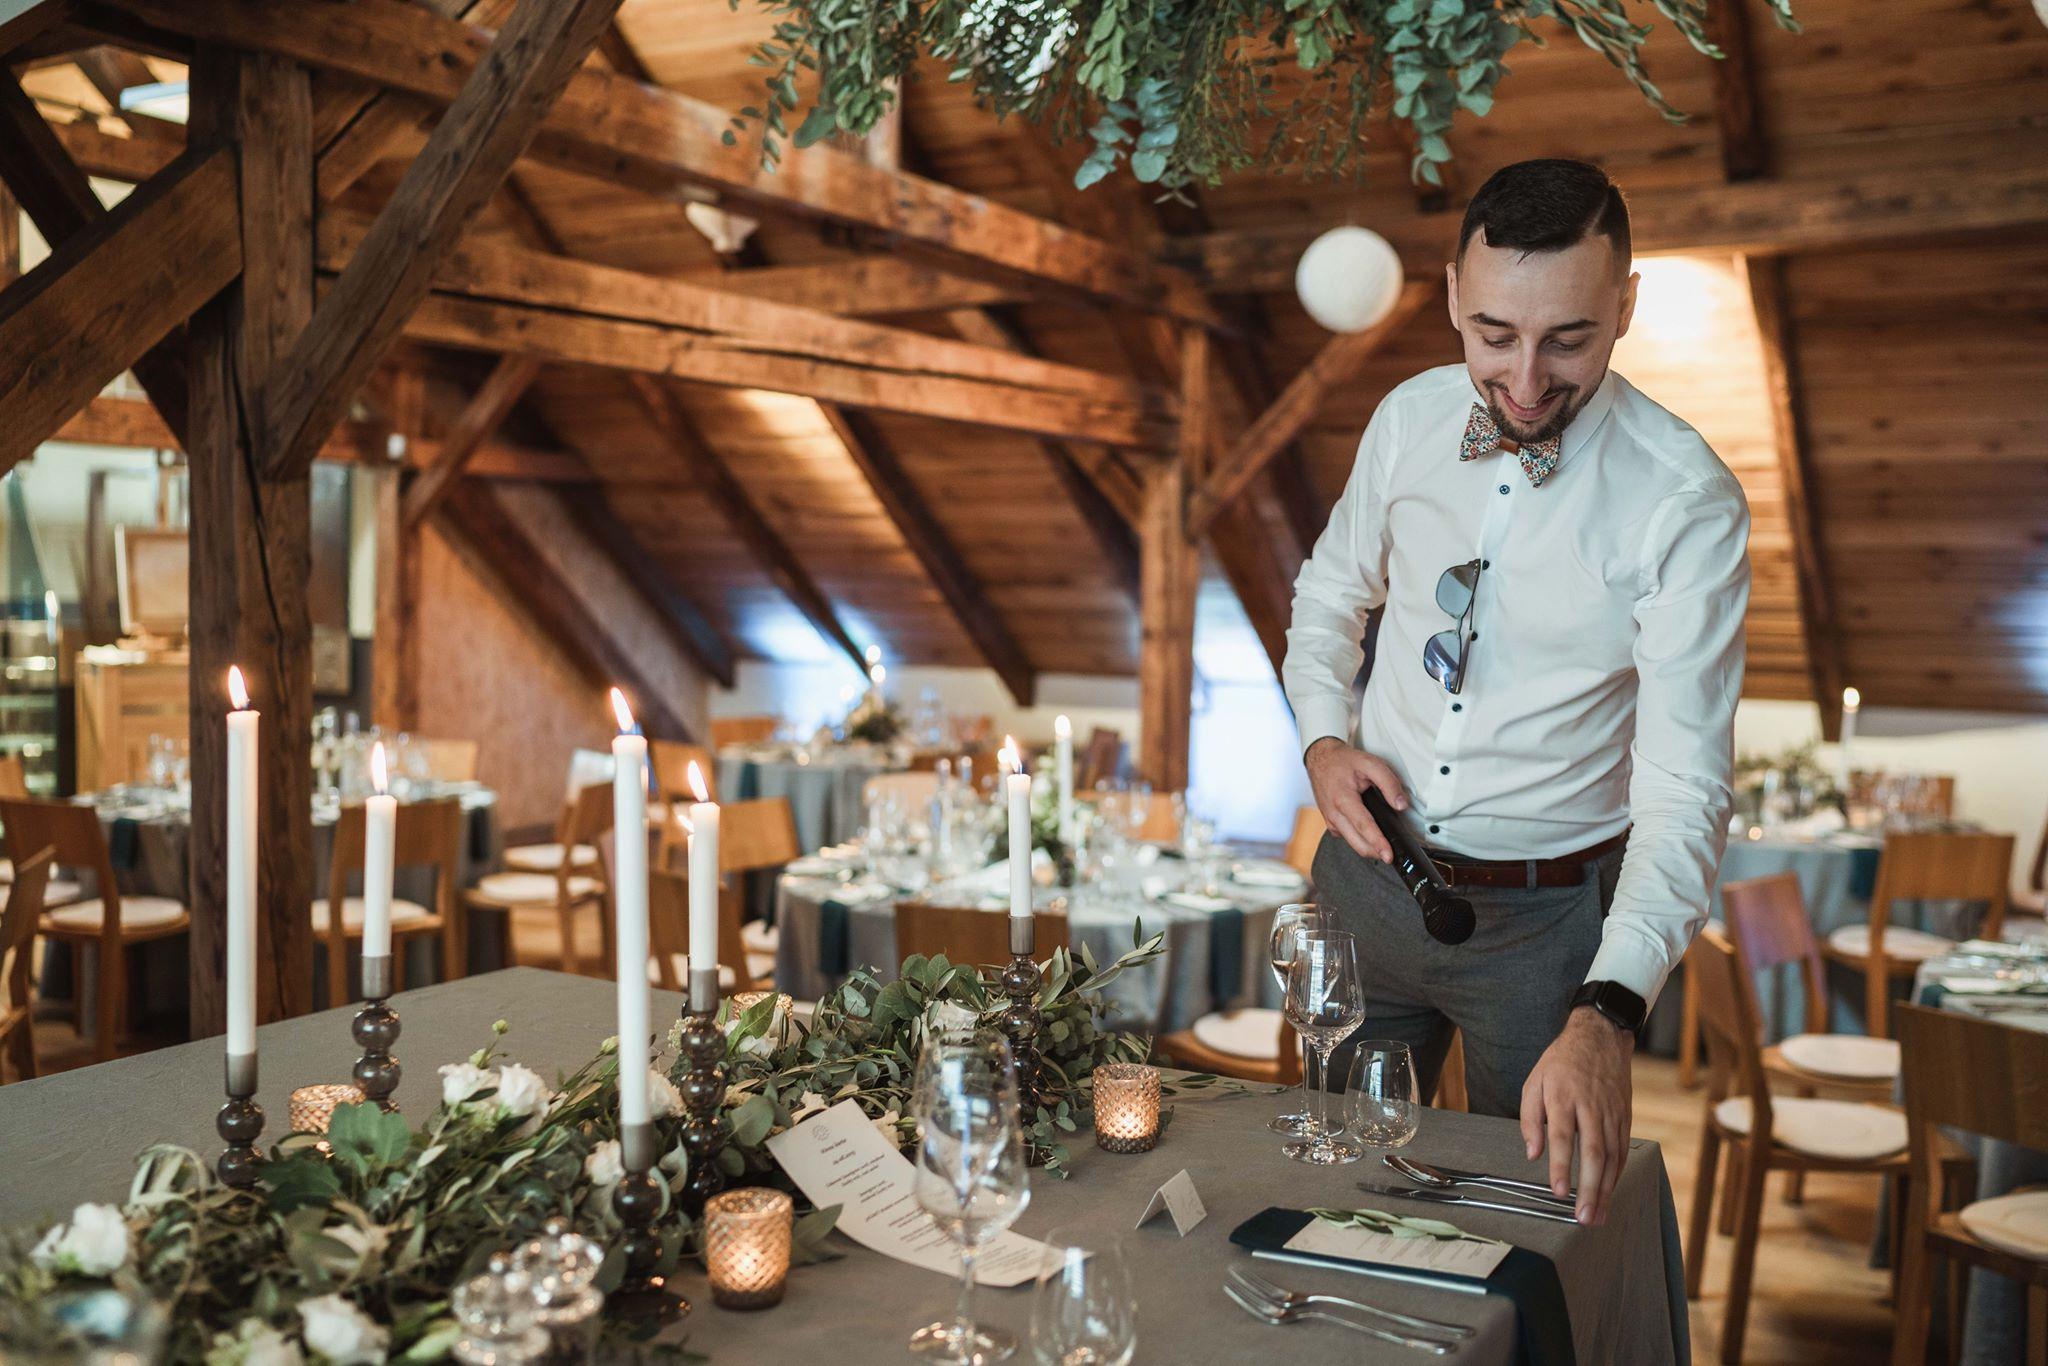 svadobny-eventovy-dj-moderator-starejsi-DJ-Mikejpg